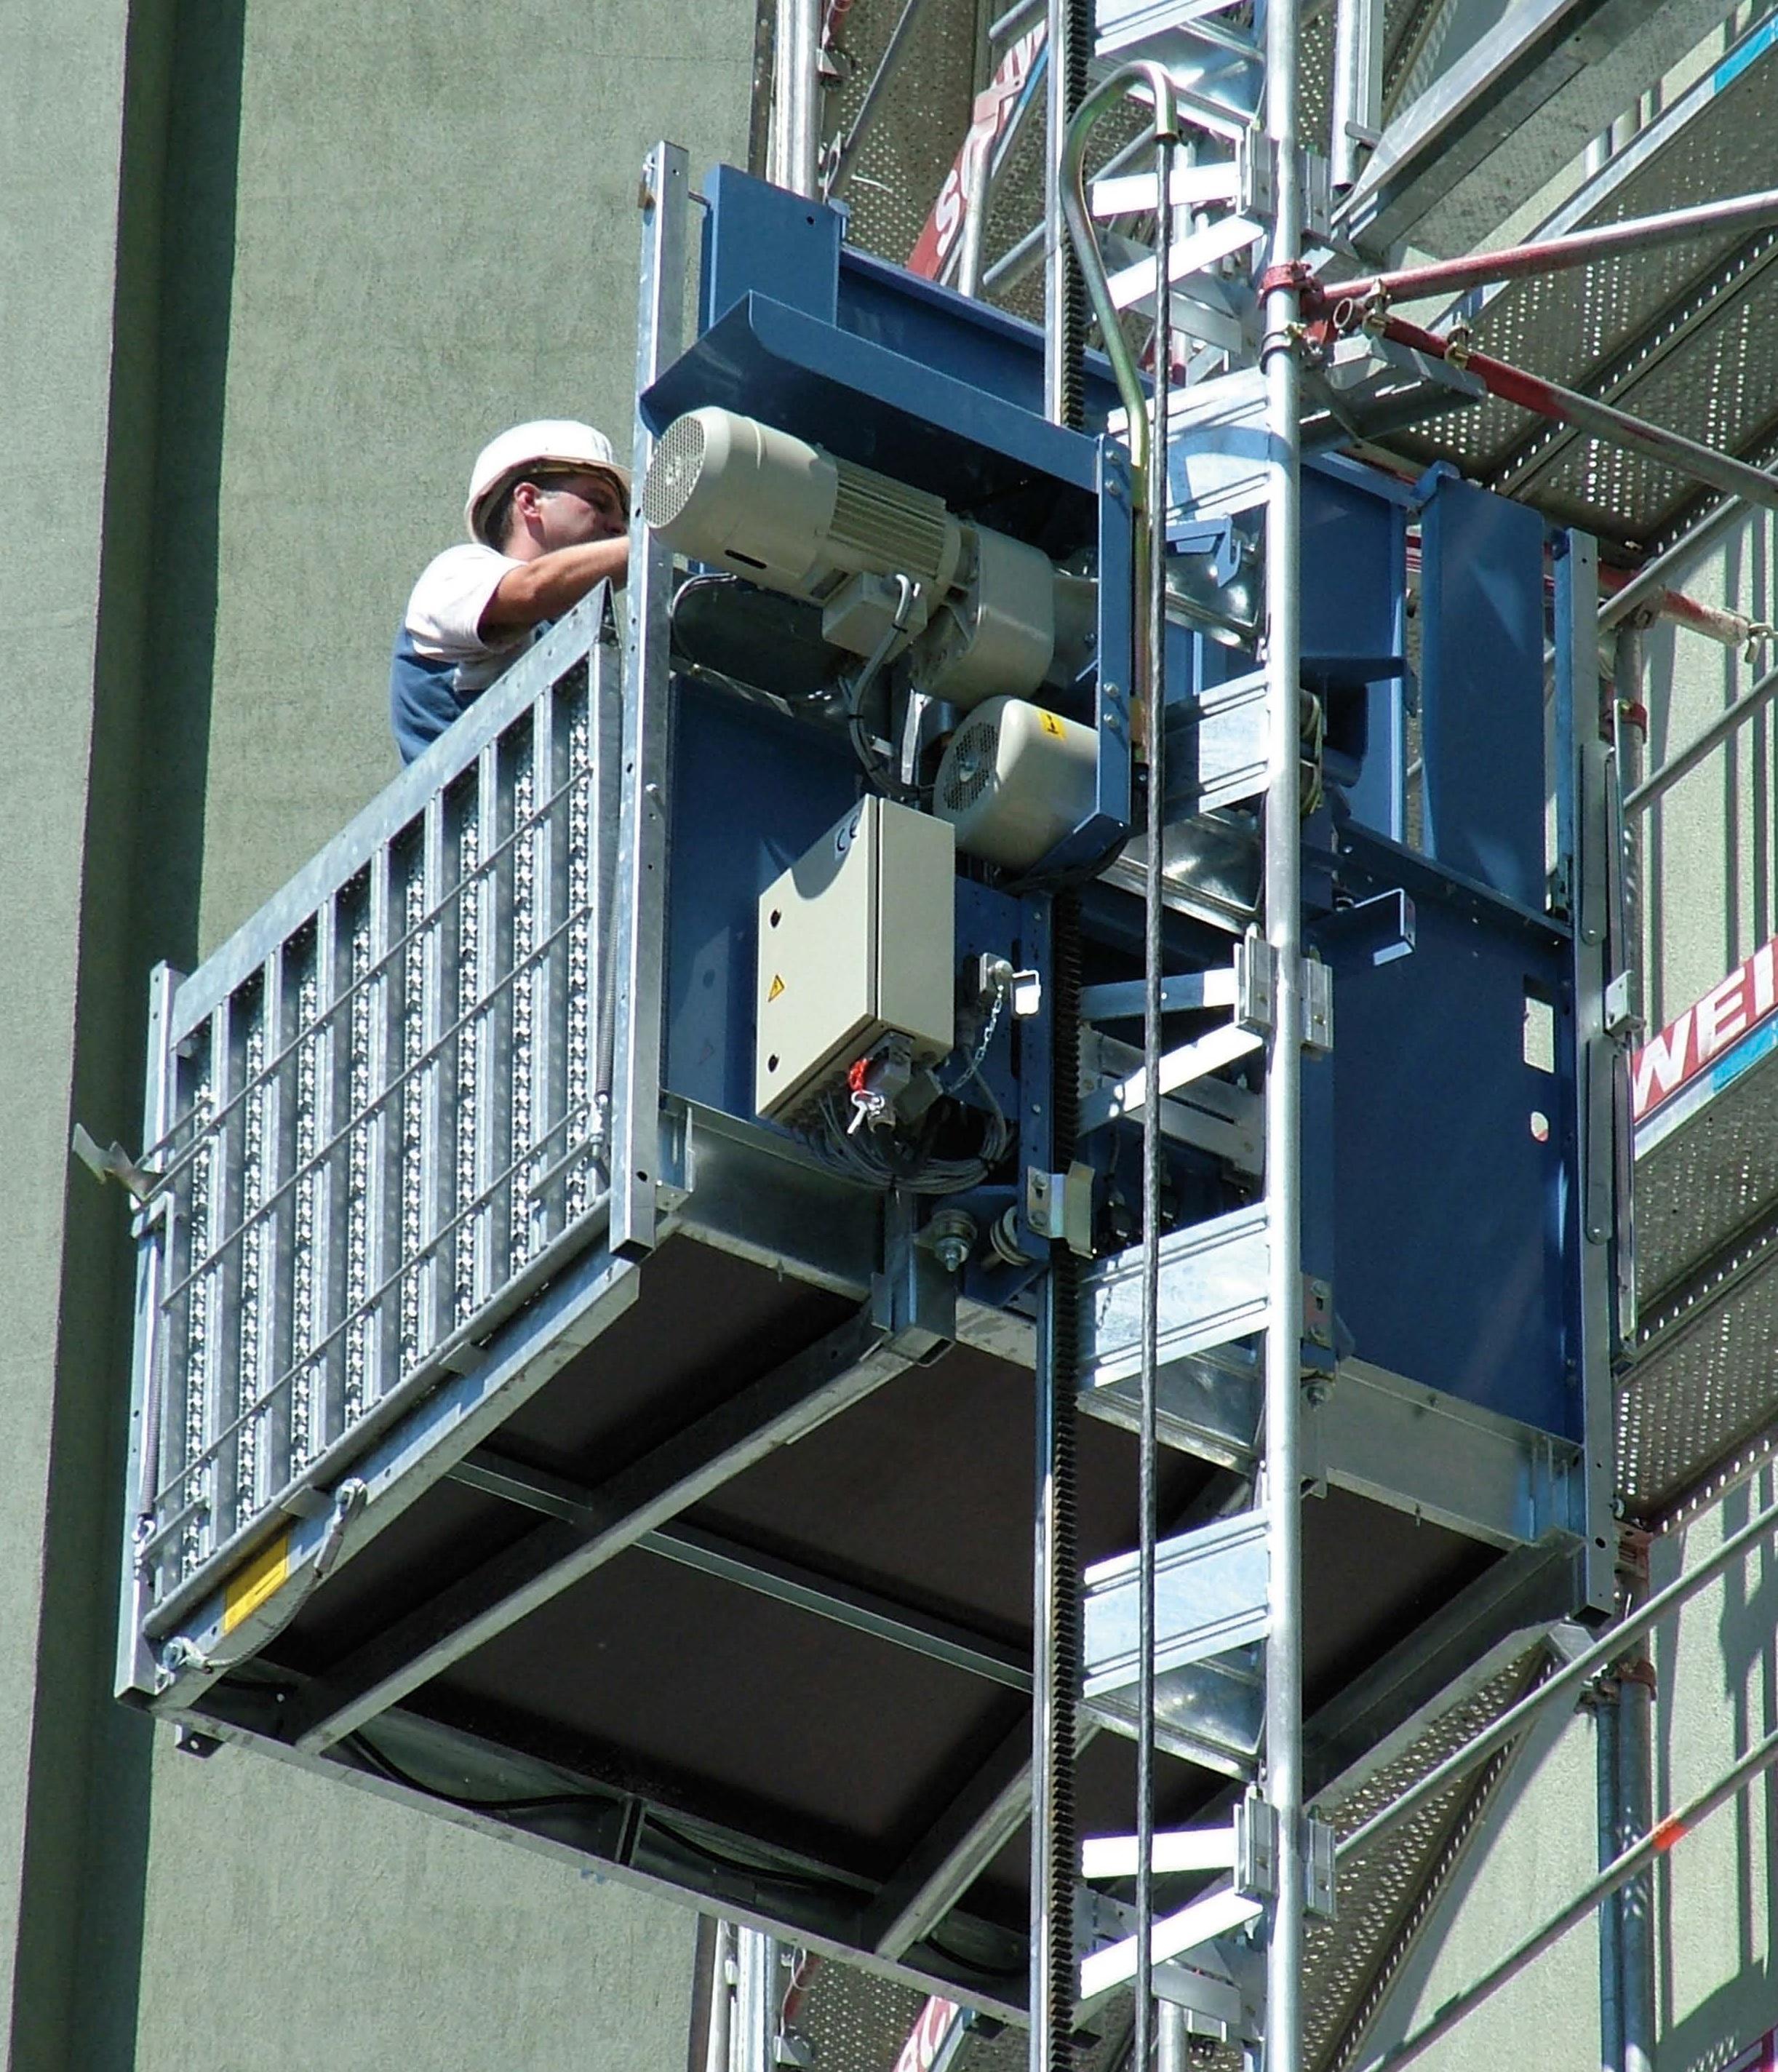 Personen- & Lastenaufzüge Mieten (Bauaufzüge)